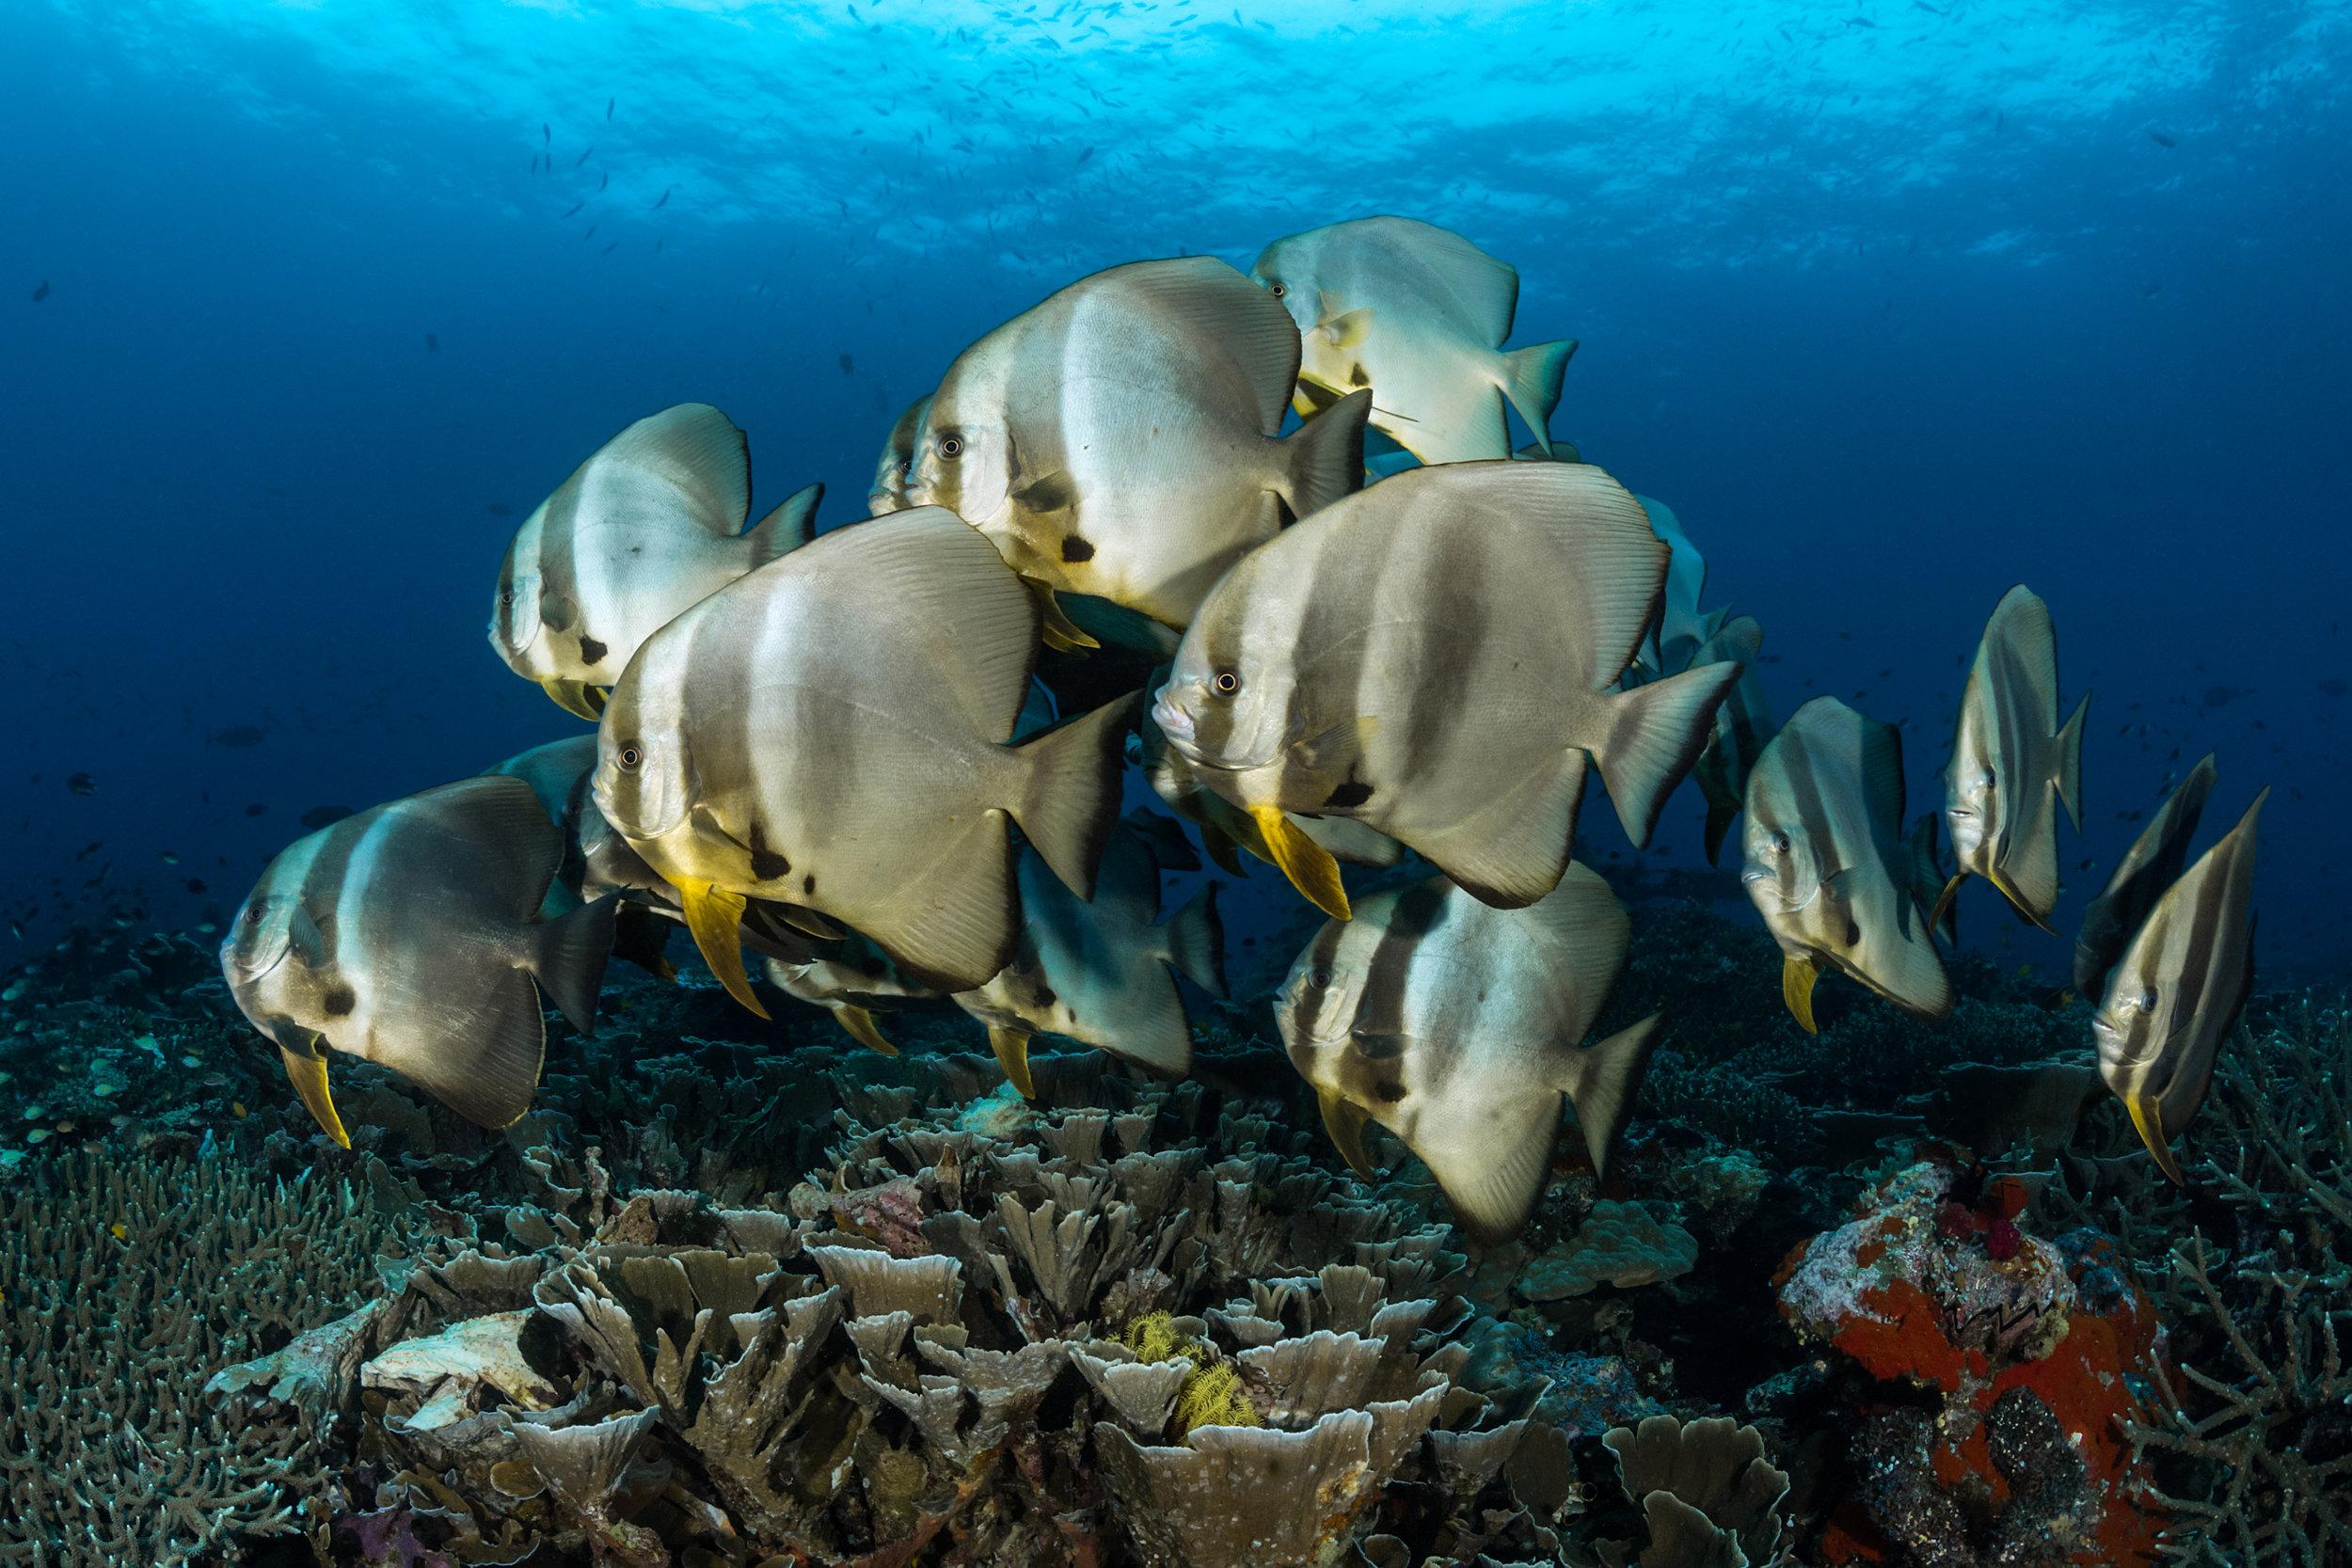 batfish credit: Fabrice dudenhofer/ coral reef image bank